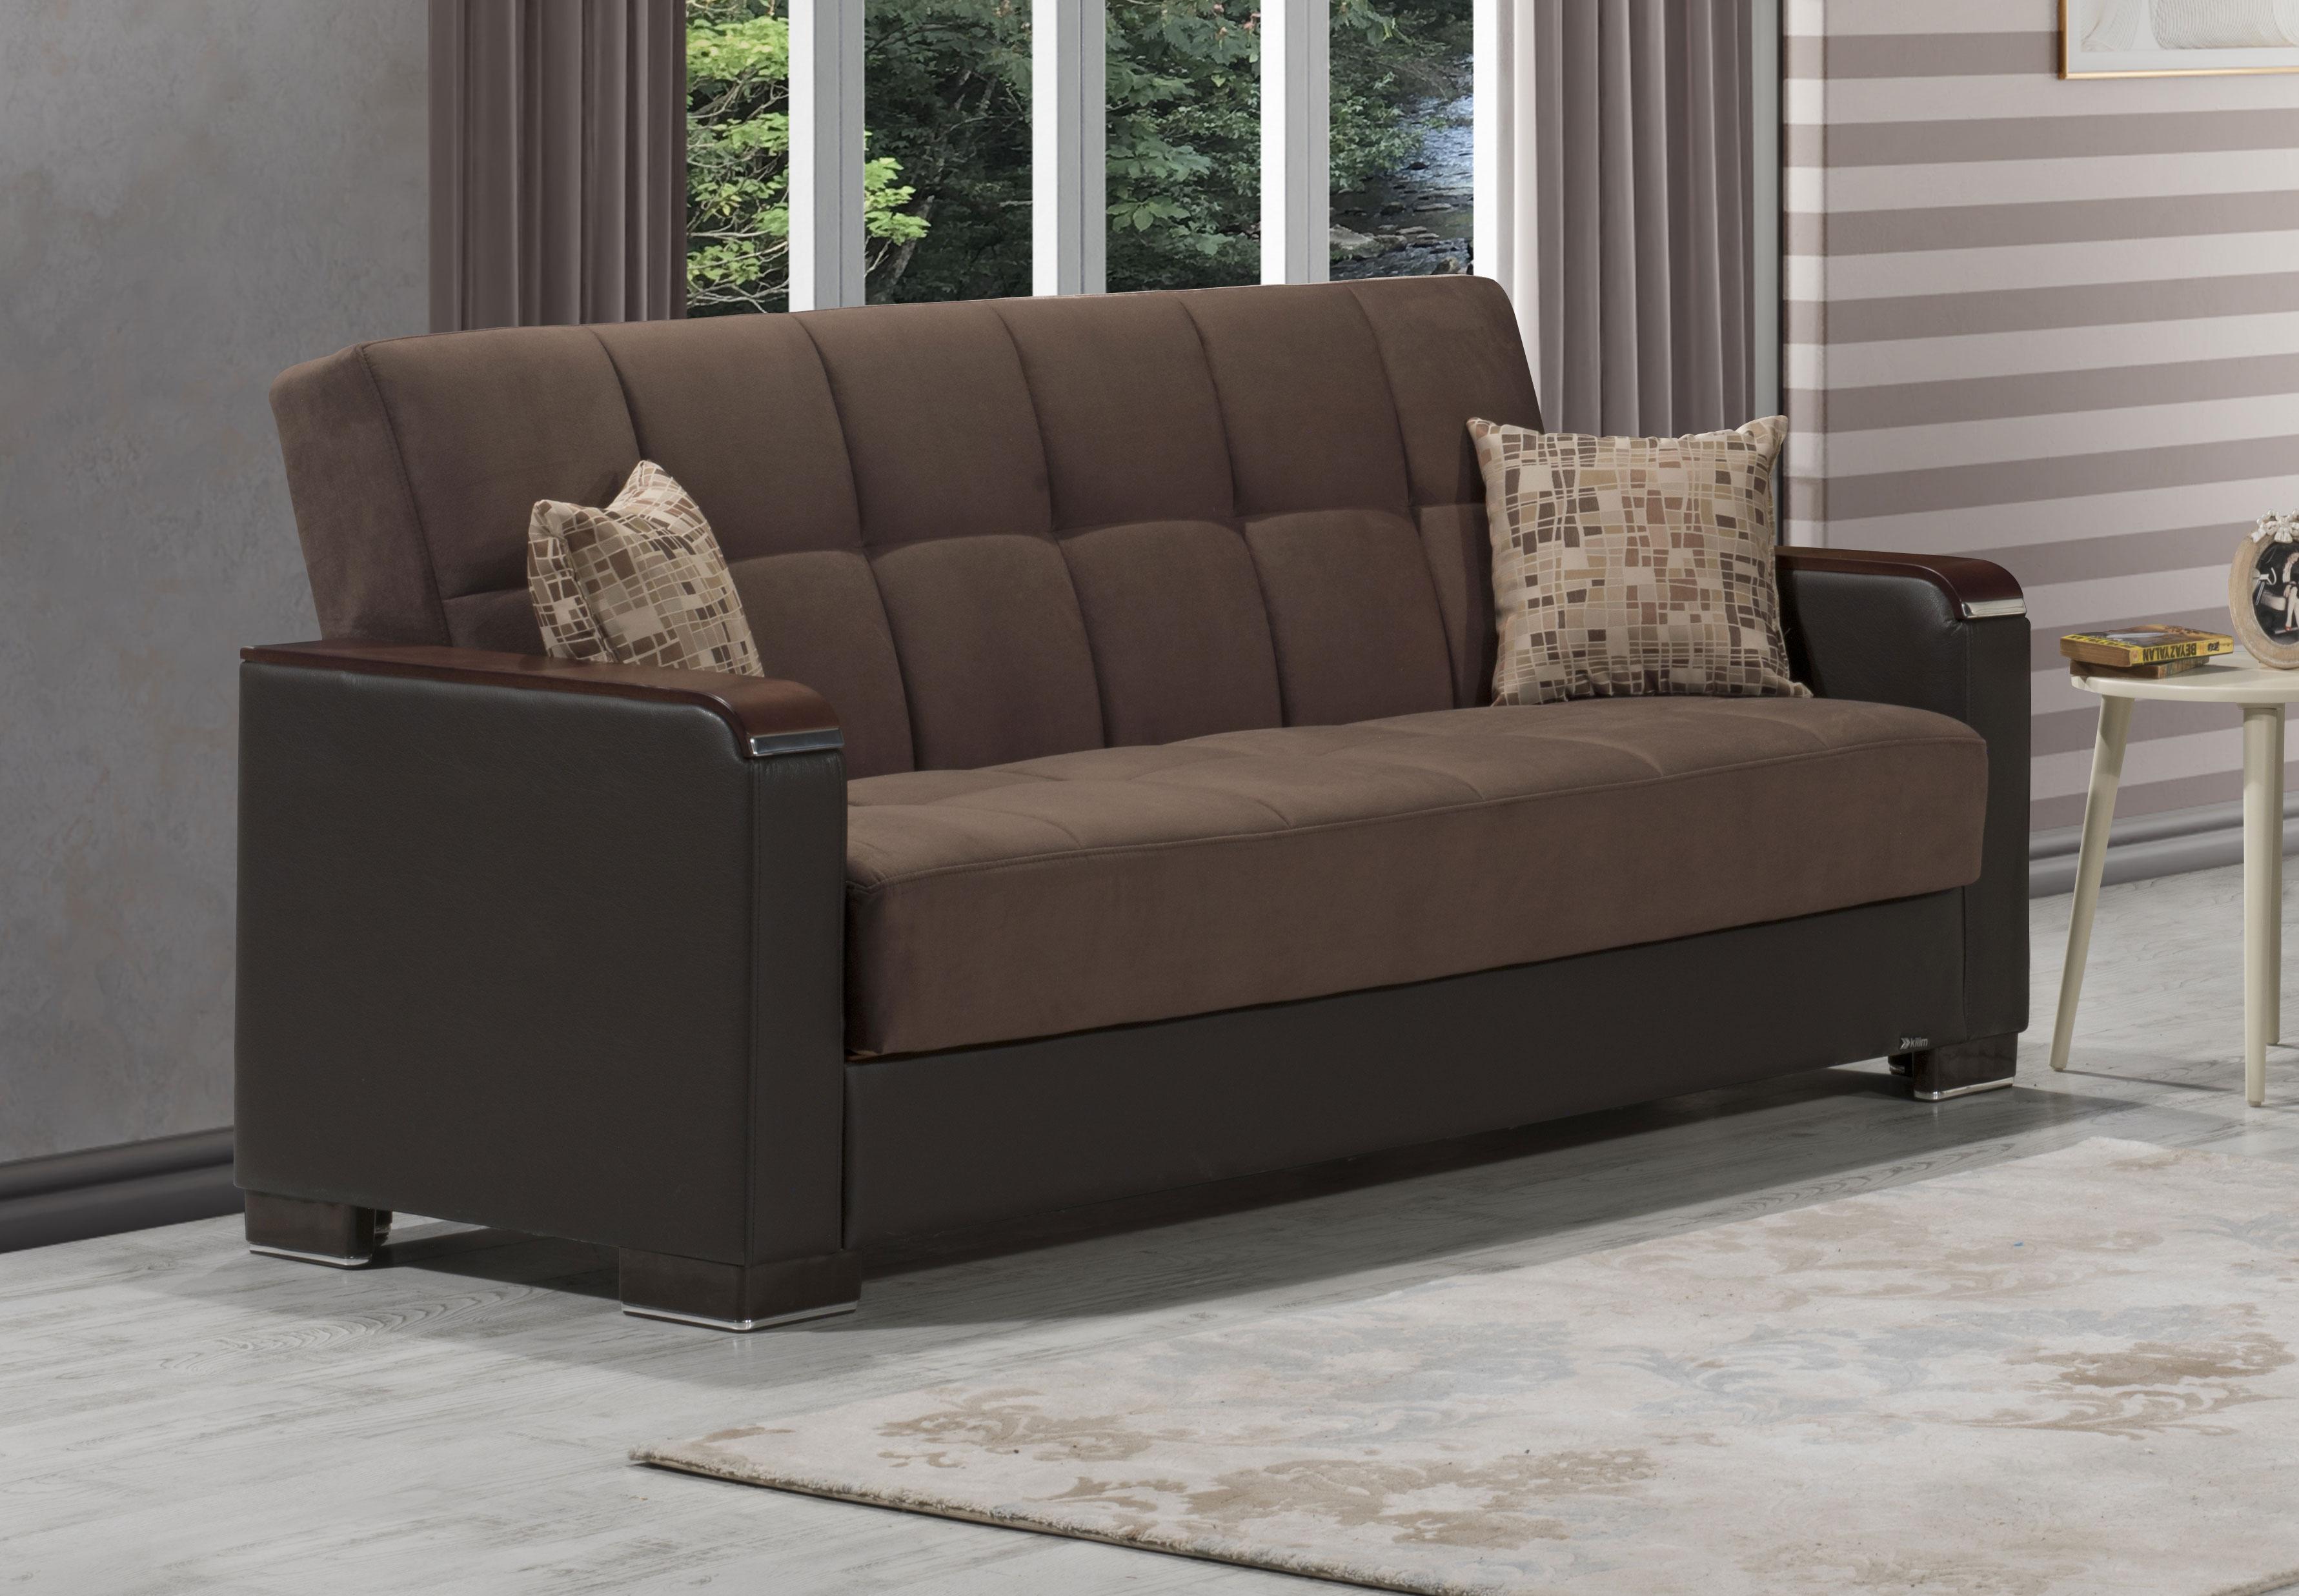 Armada X Brown Microfiber Sofa Bed By Casamode